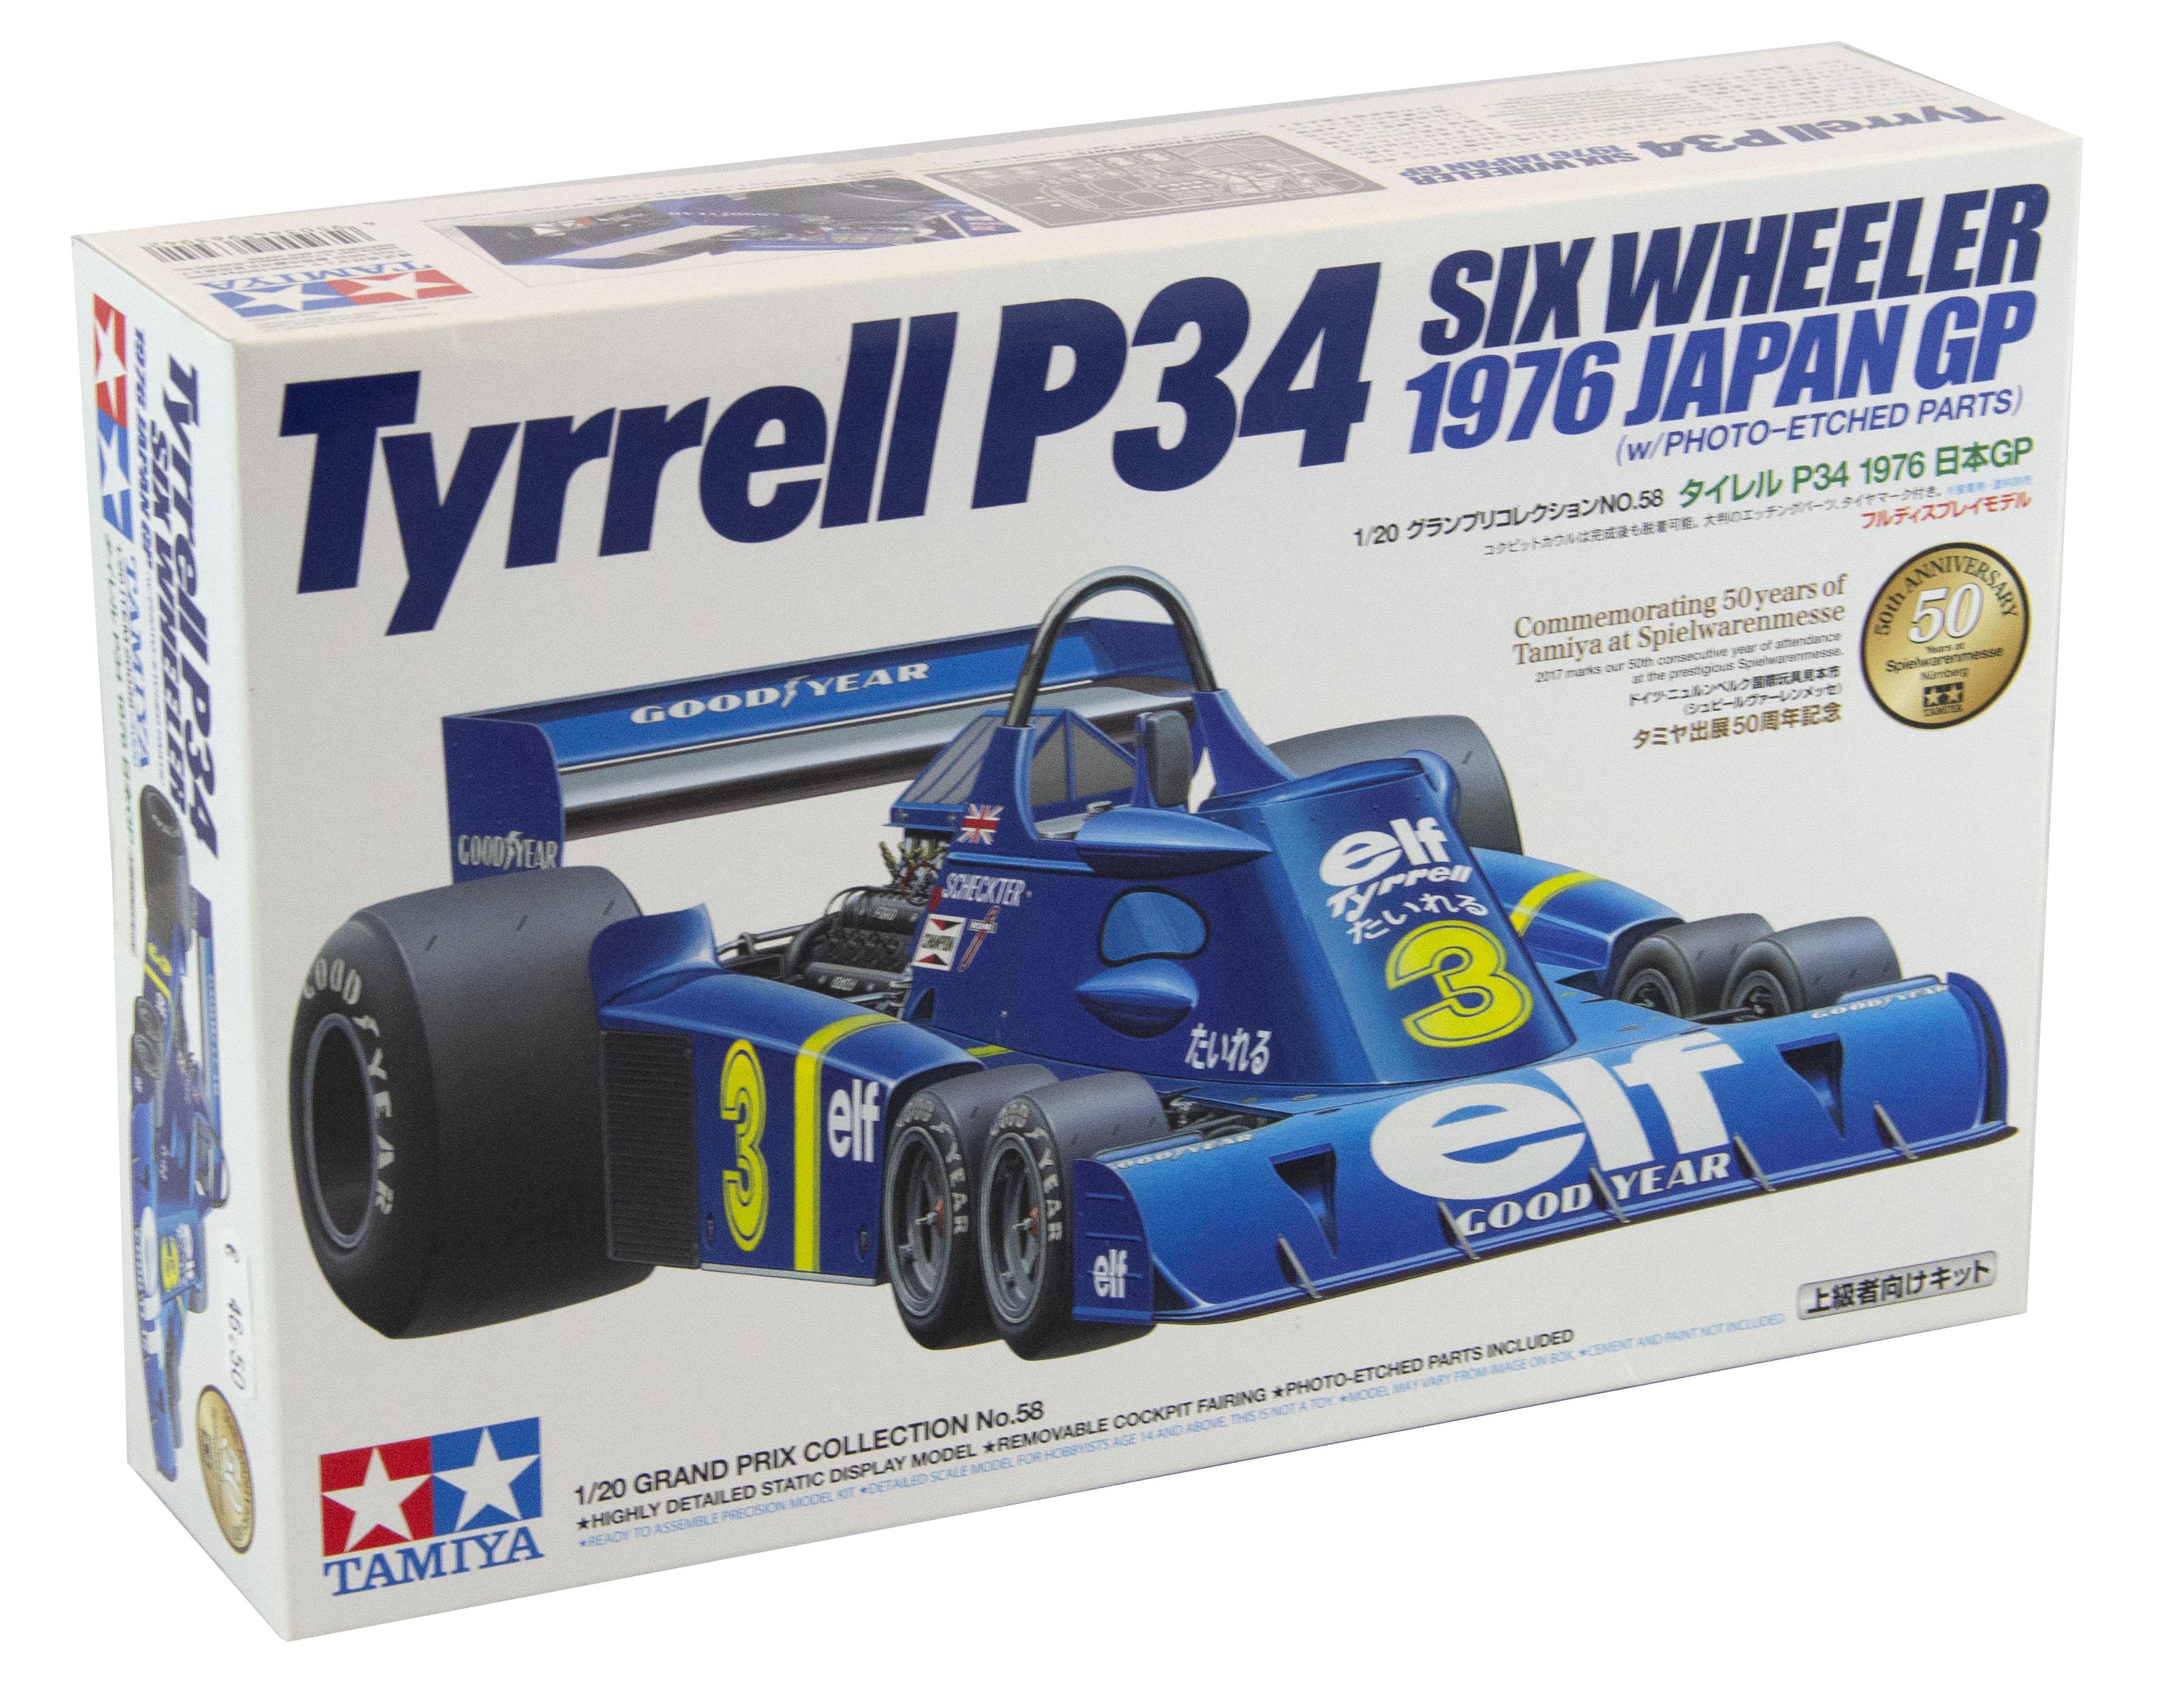 Tyrrel P34 Six Wheeler 1976 Japan GP